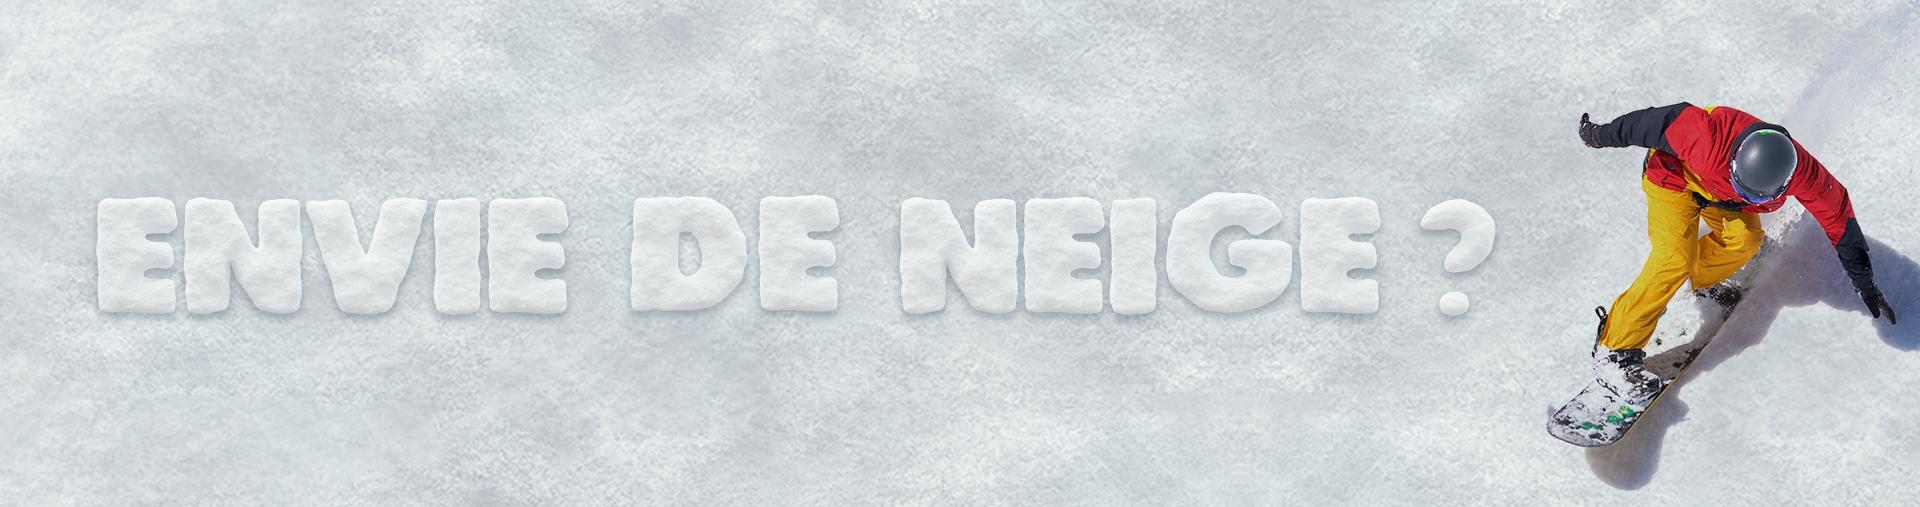 NEIGE-EB